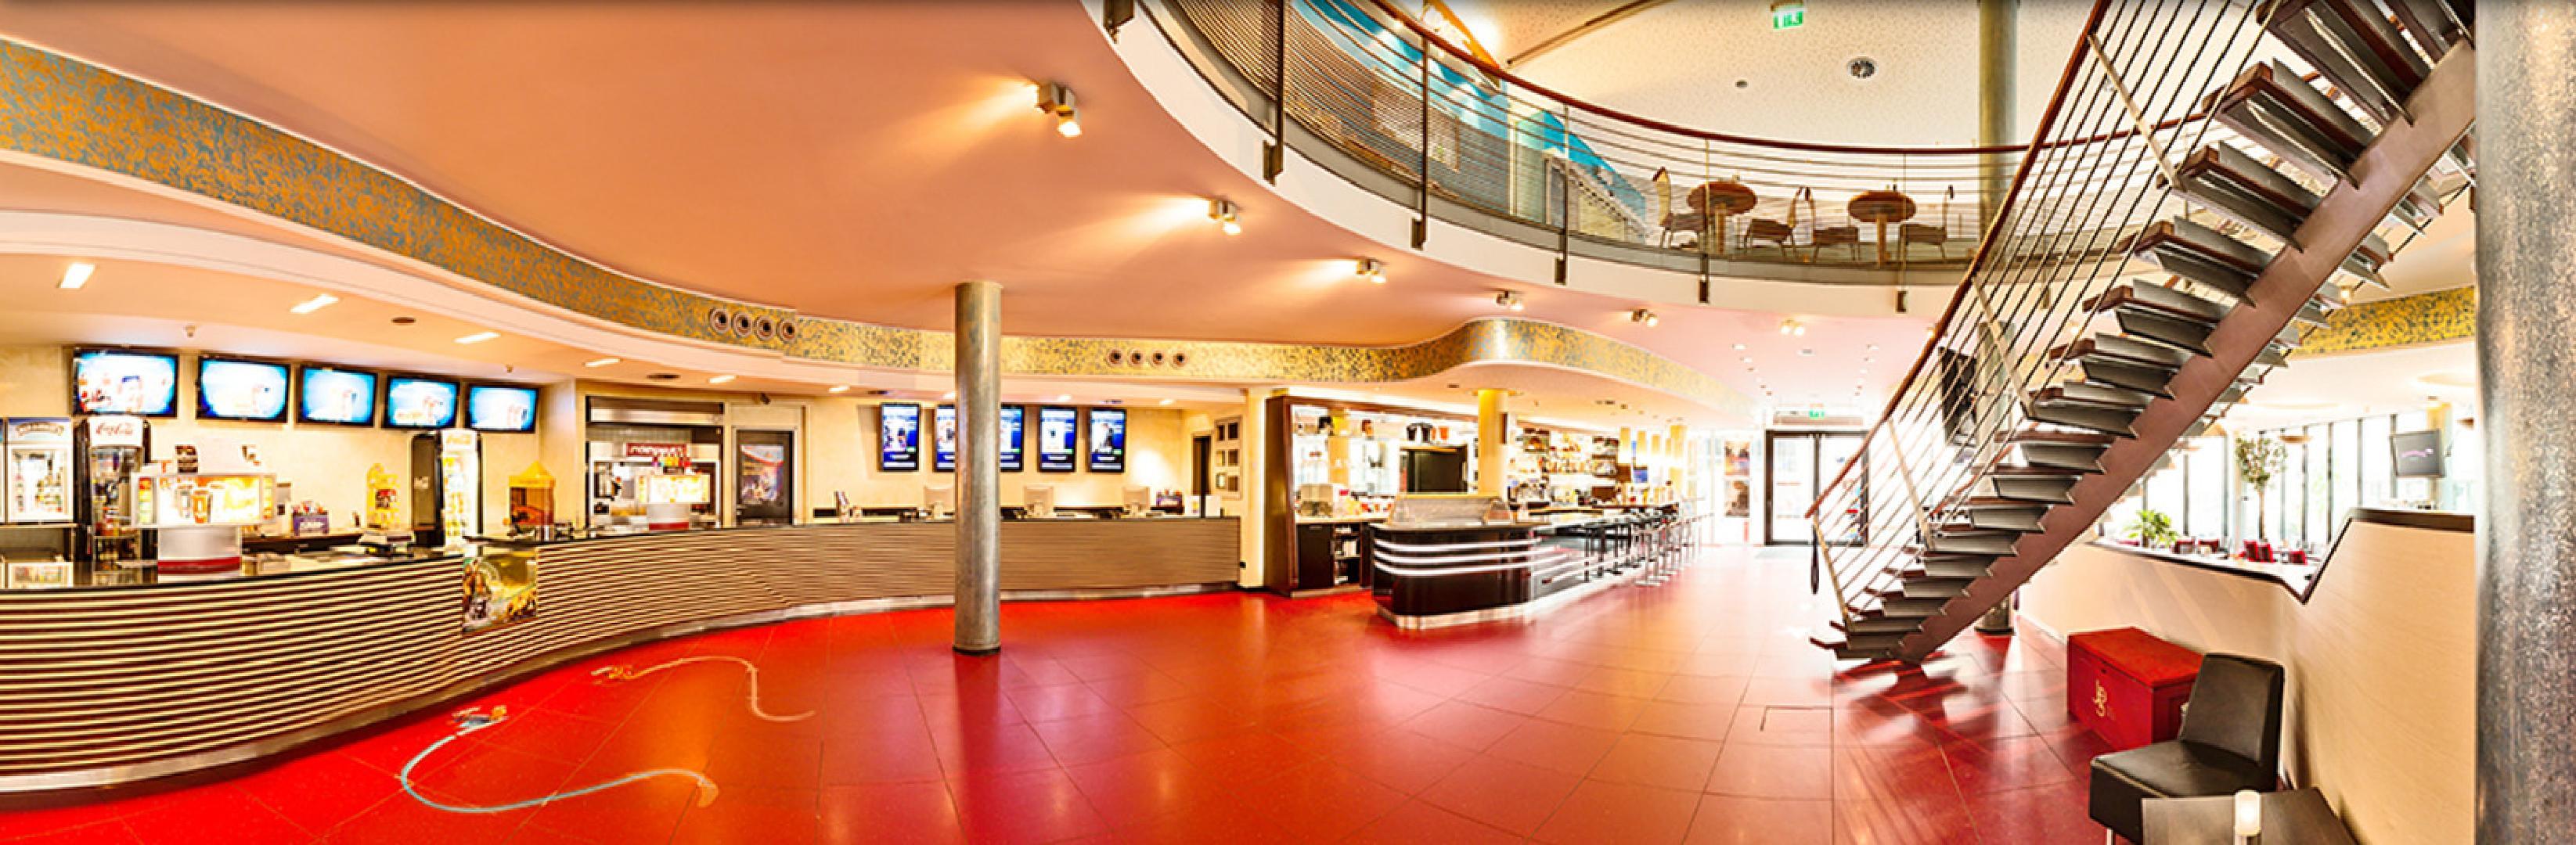 Admiral Filmpalast Nürnberg